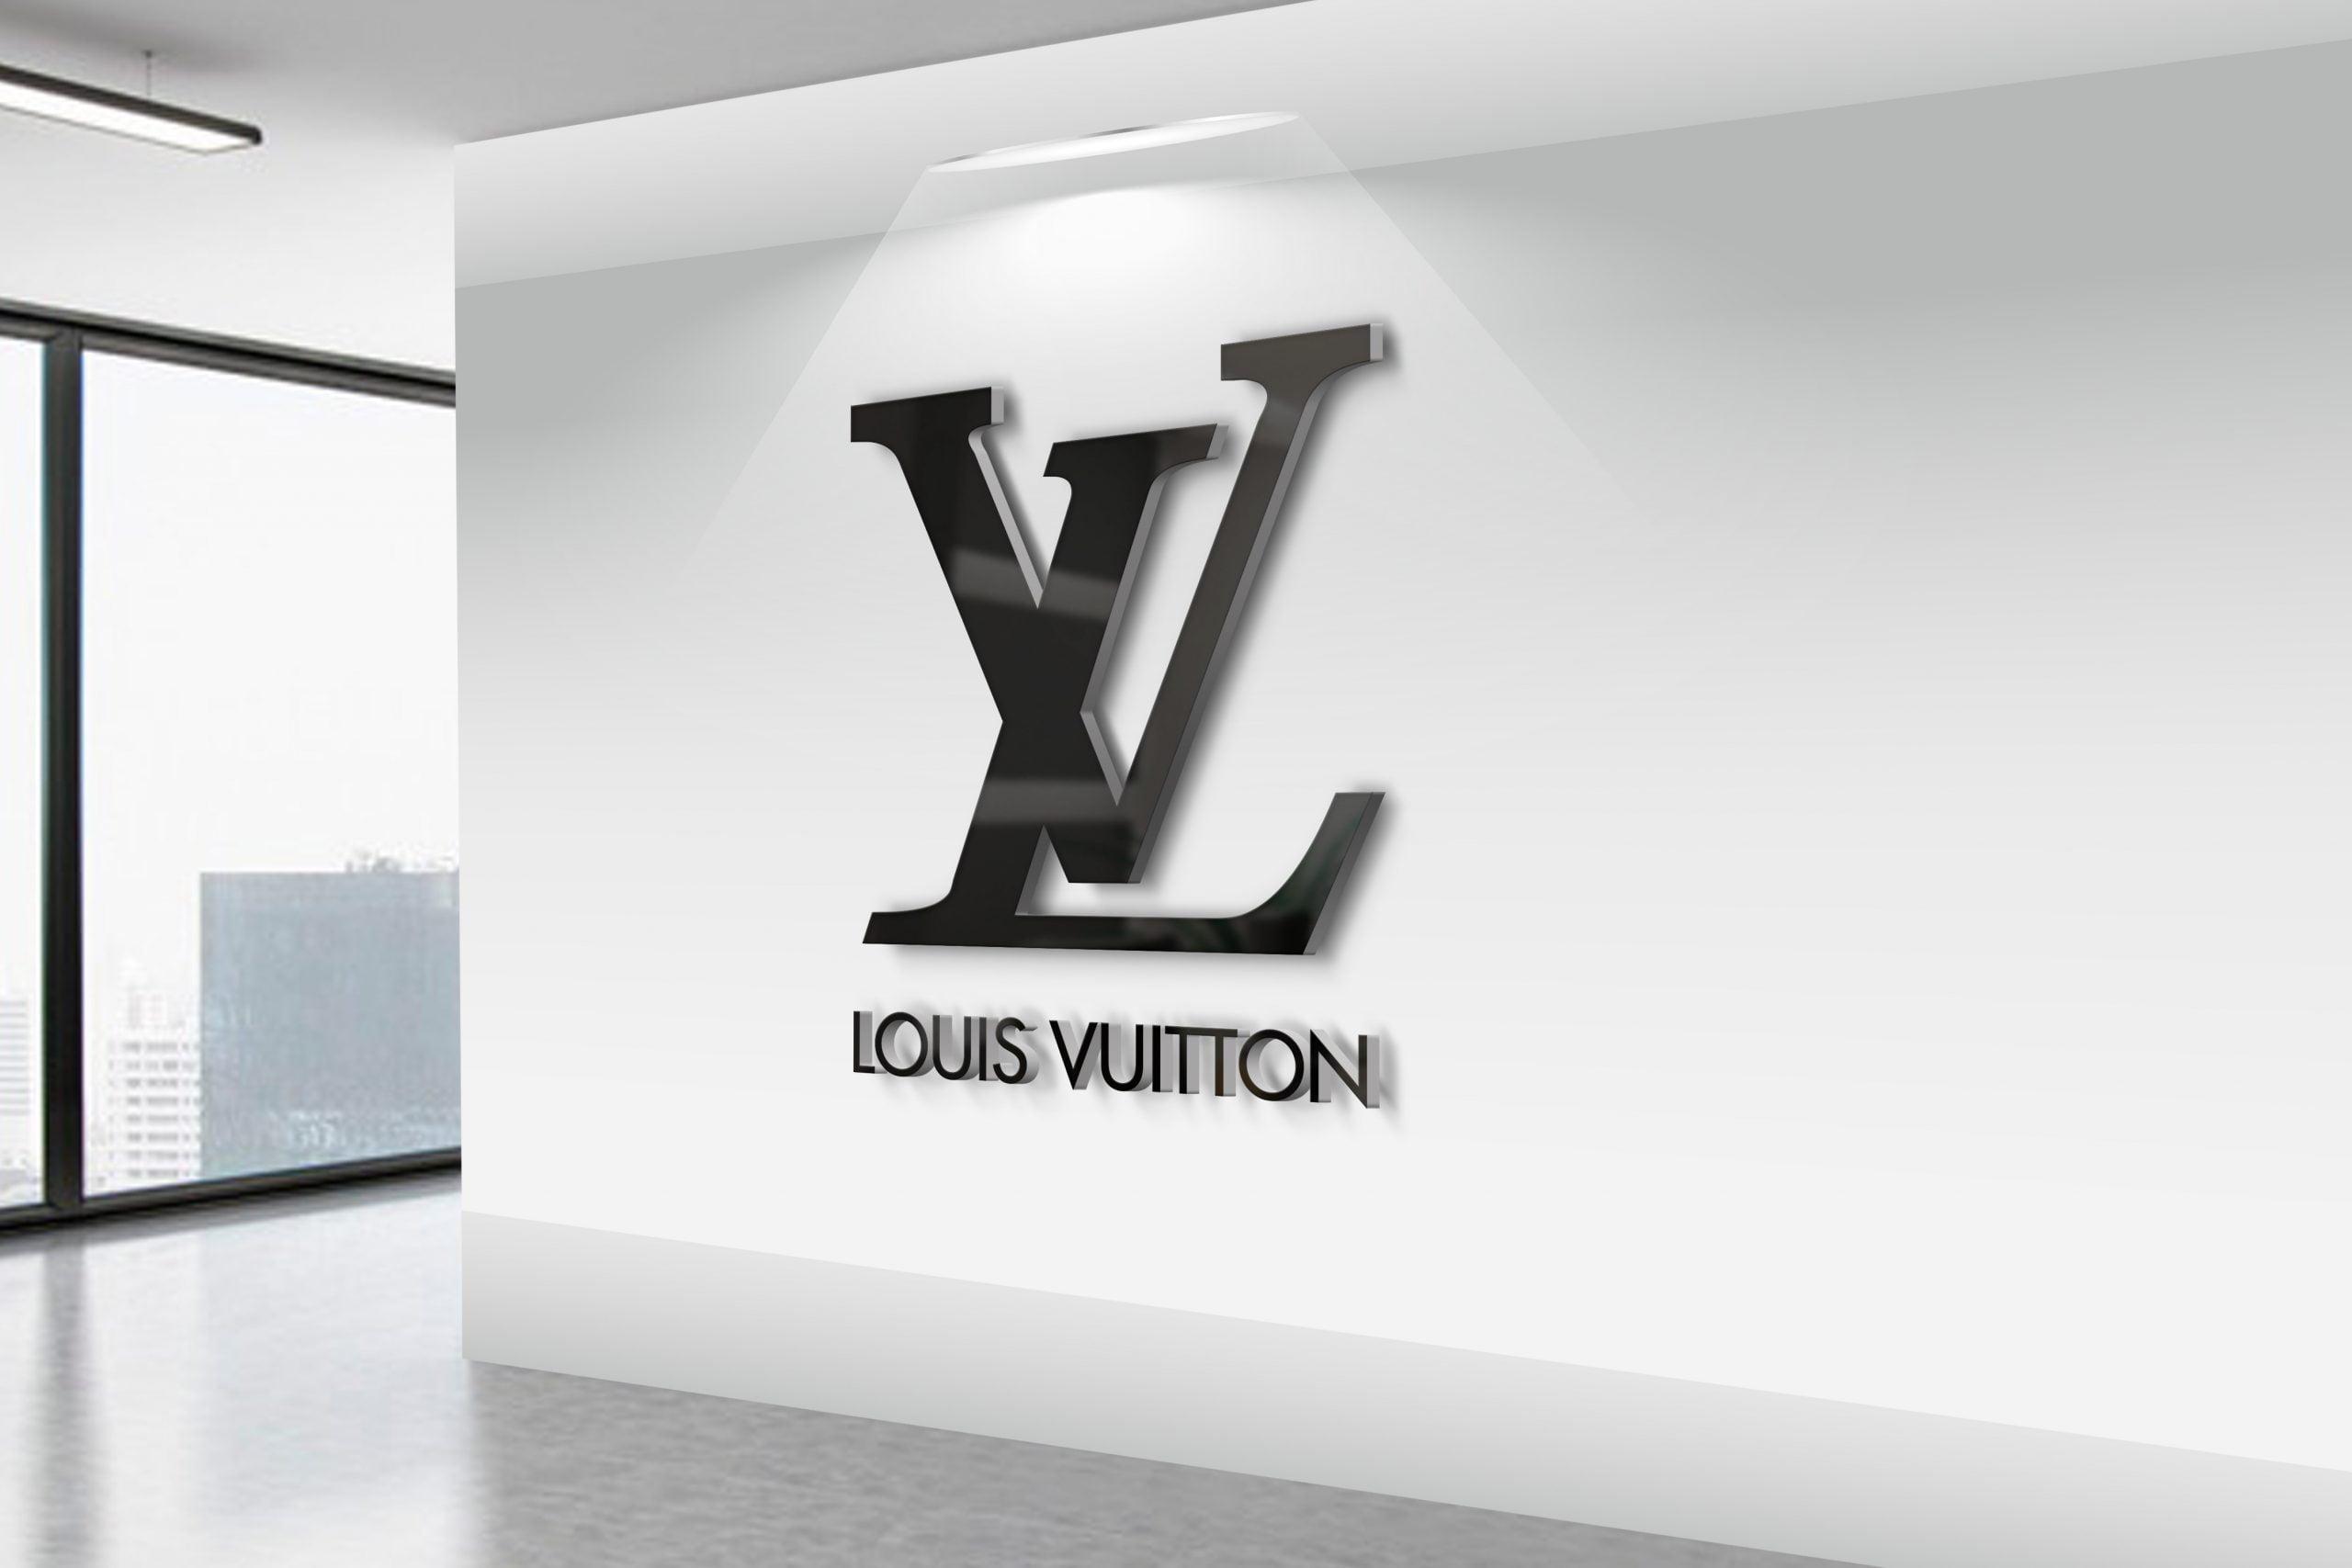 Louis-Vuitton-3D-Wall-Logo-MockUp